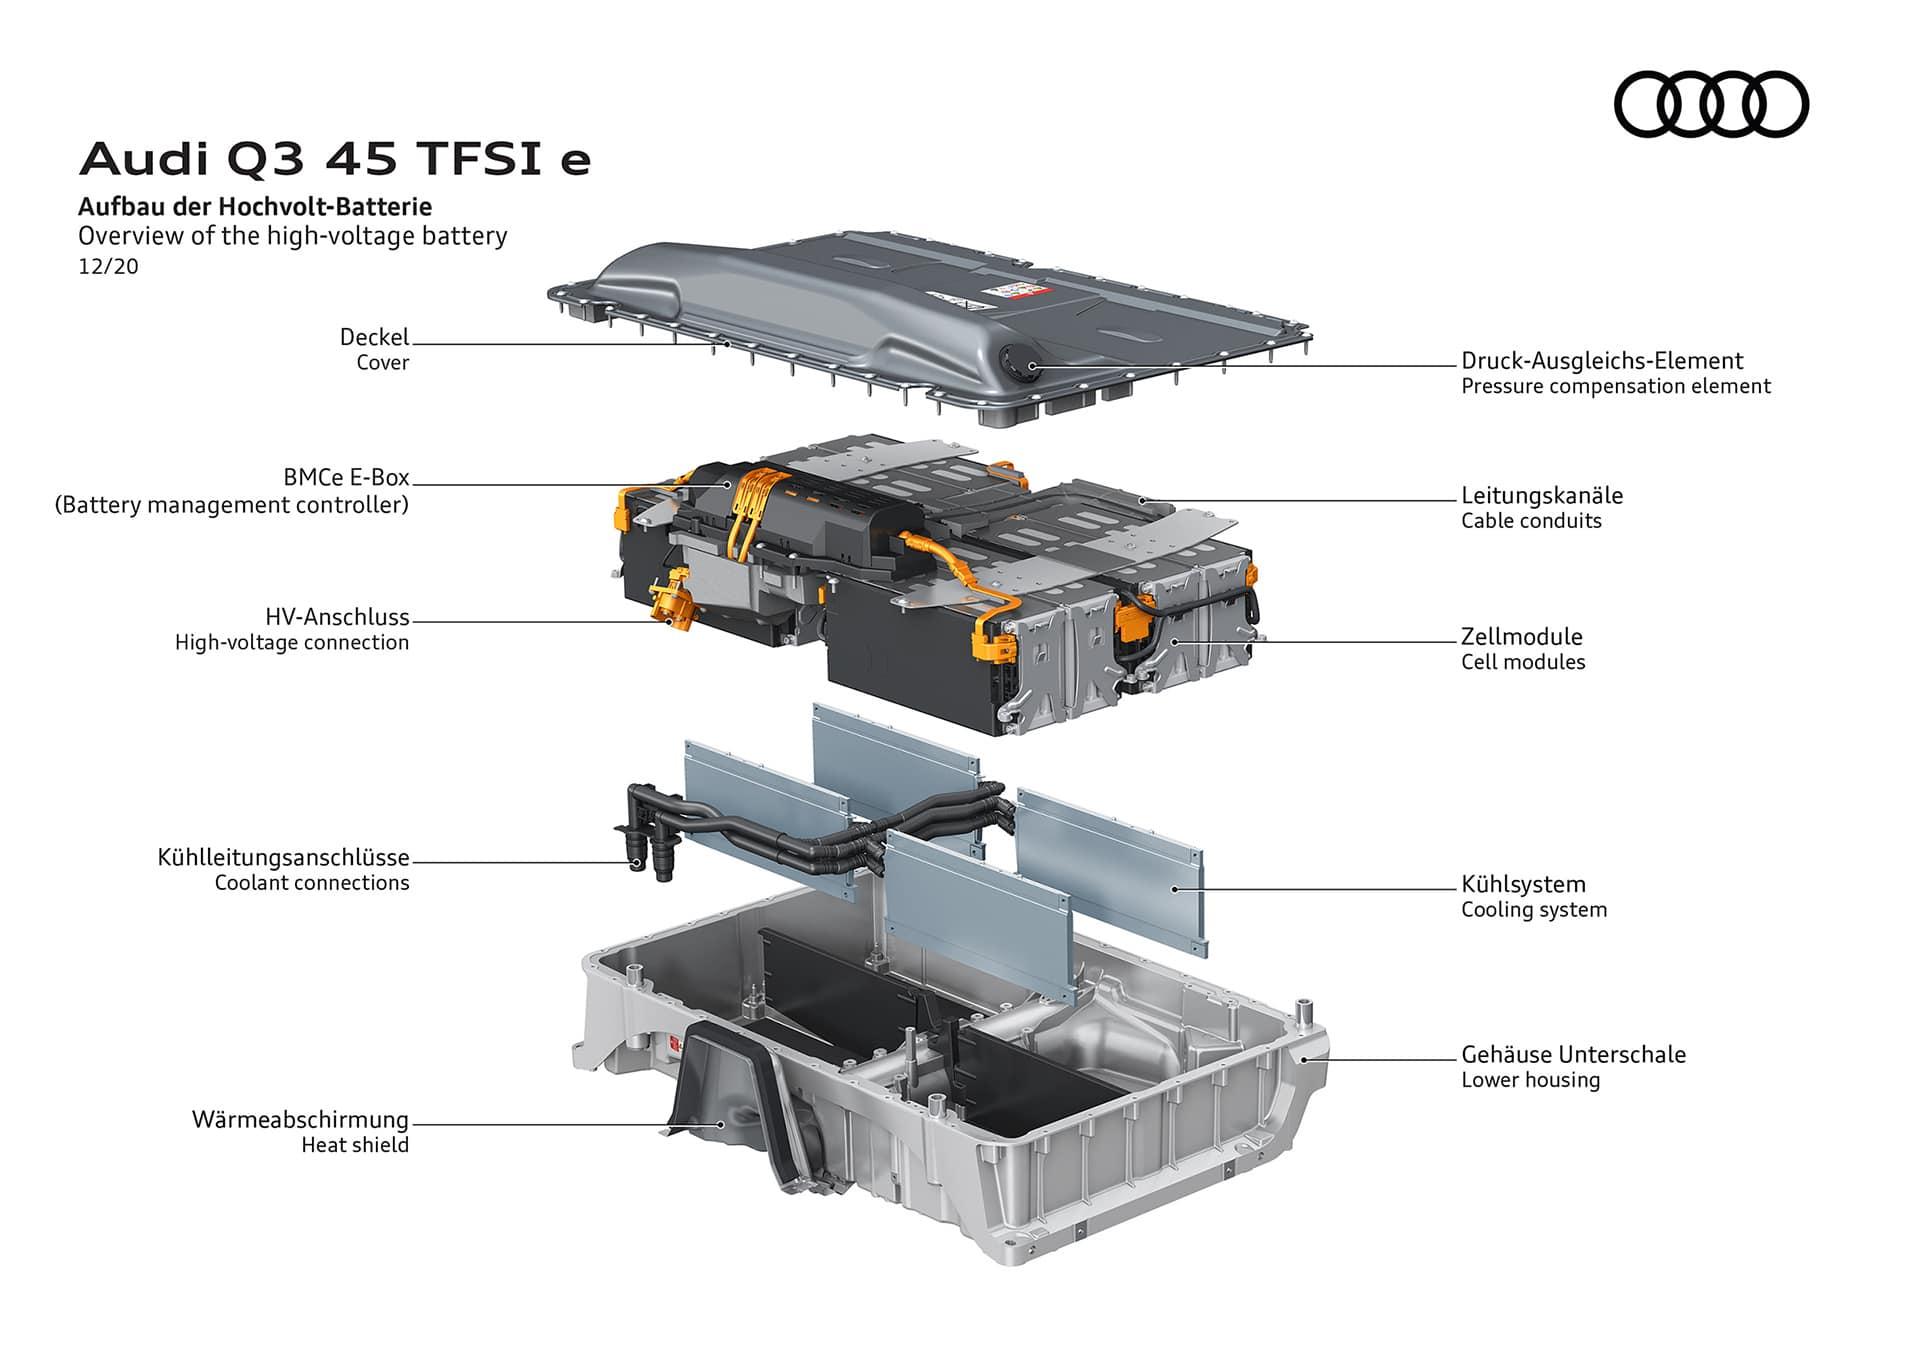 AUDI Q3 TFSI e 75 Αυτά είναι τα plug-in hybrid Audi Q3 TFSI e & Q3 Sportback TFSI e Audi, Audi Q3, Hybrid, plug-in hybrid, Q3, ειδήσεις, Νέα, υβριδικό